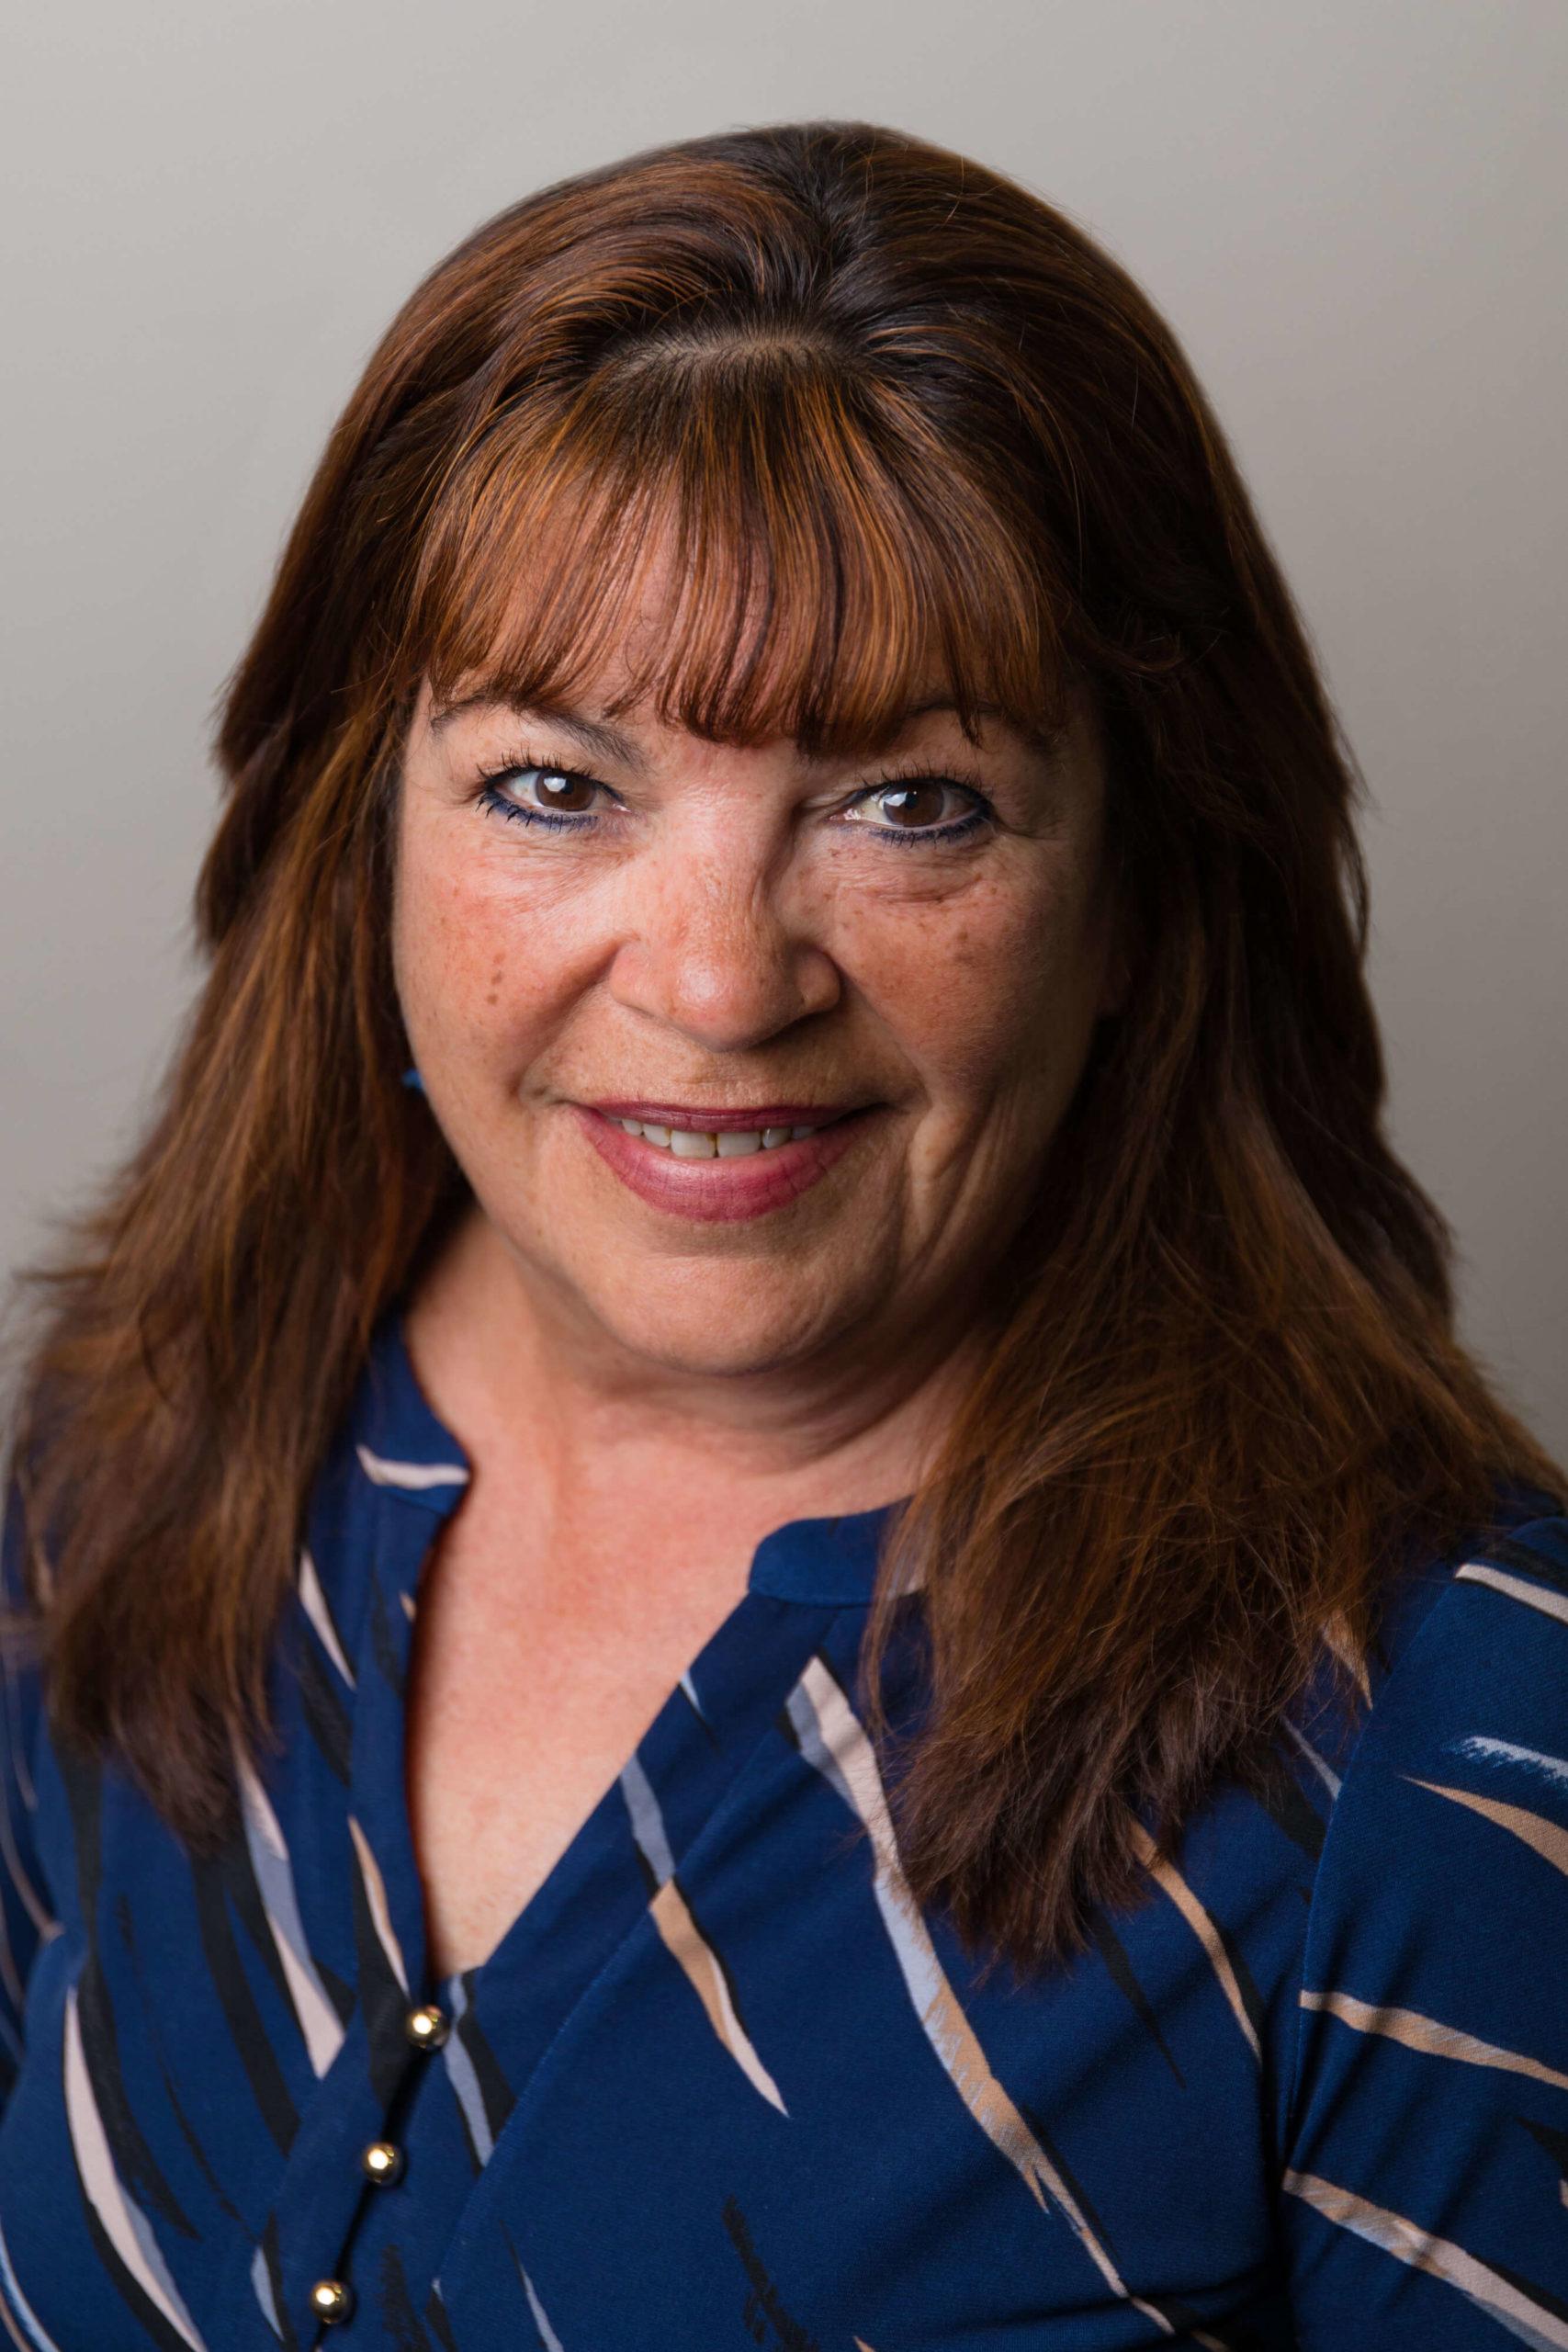 Diane Schumacher, Operations Manager